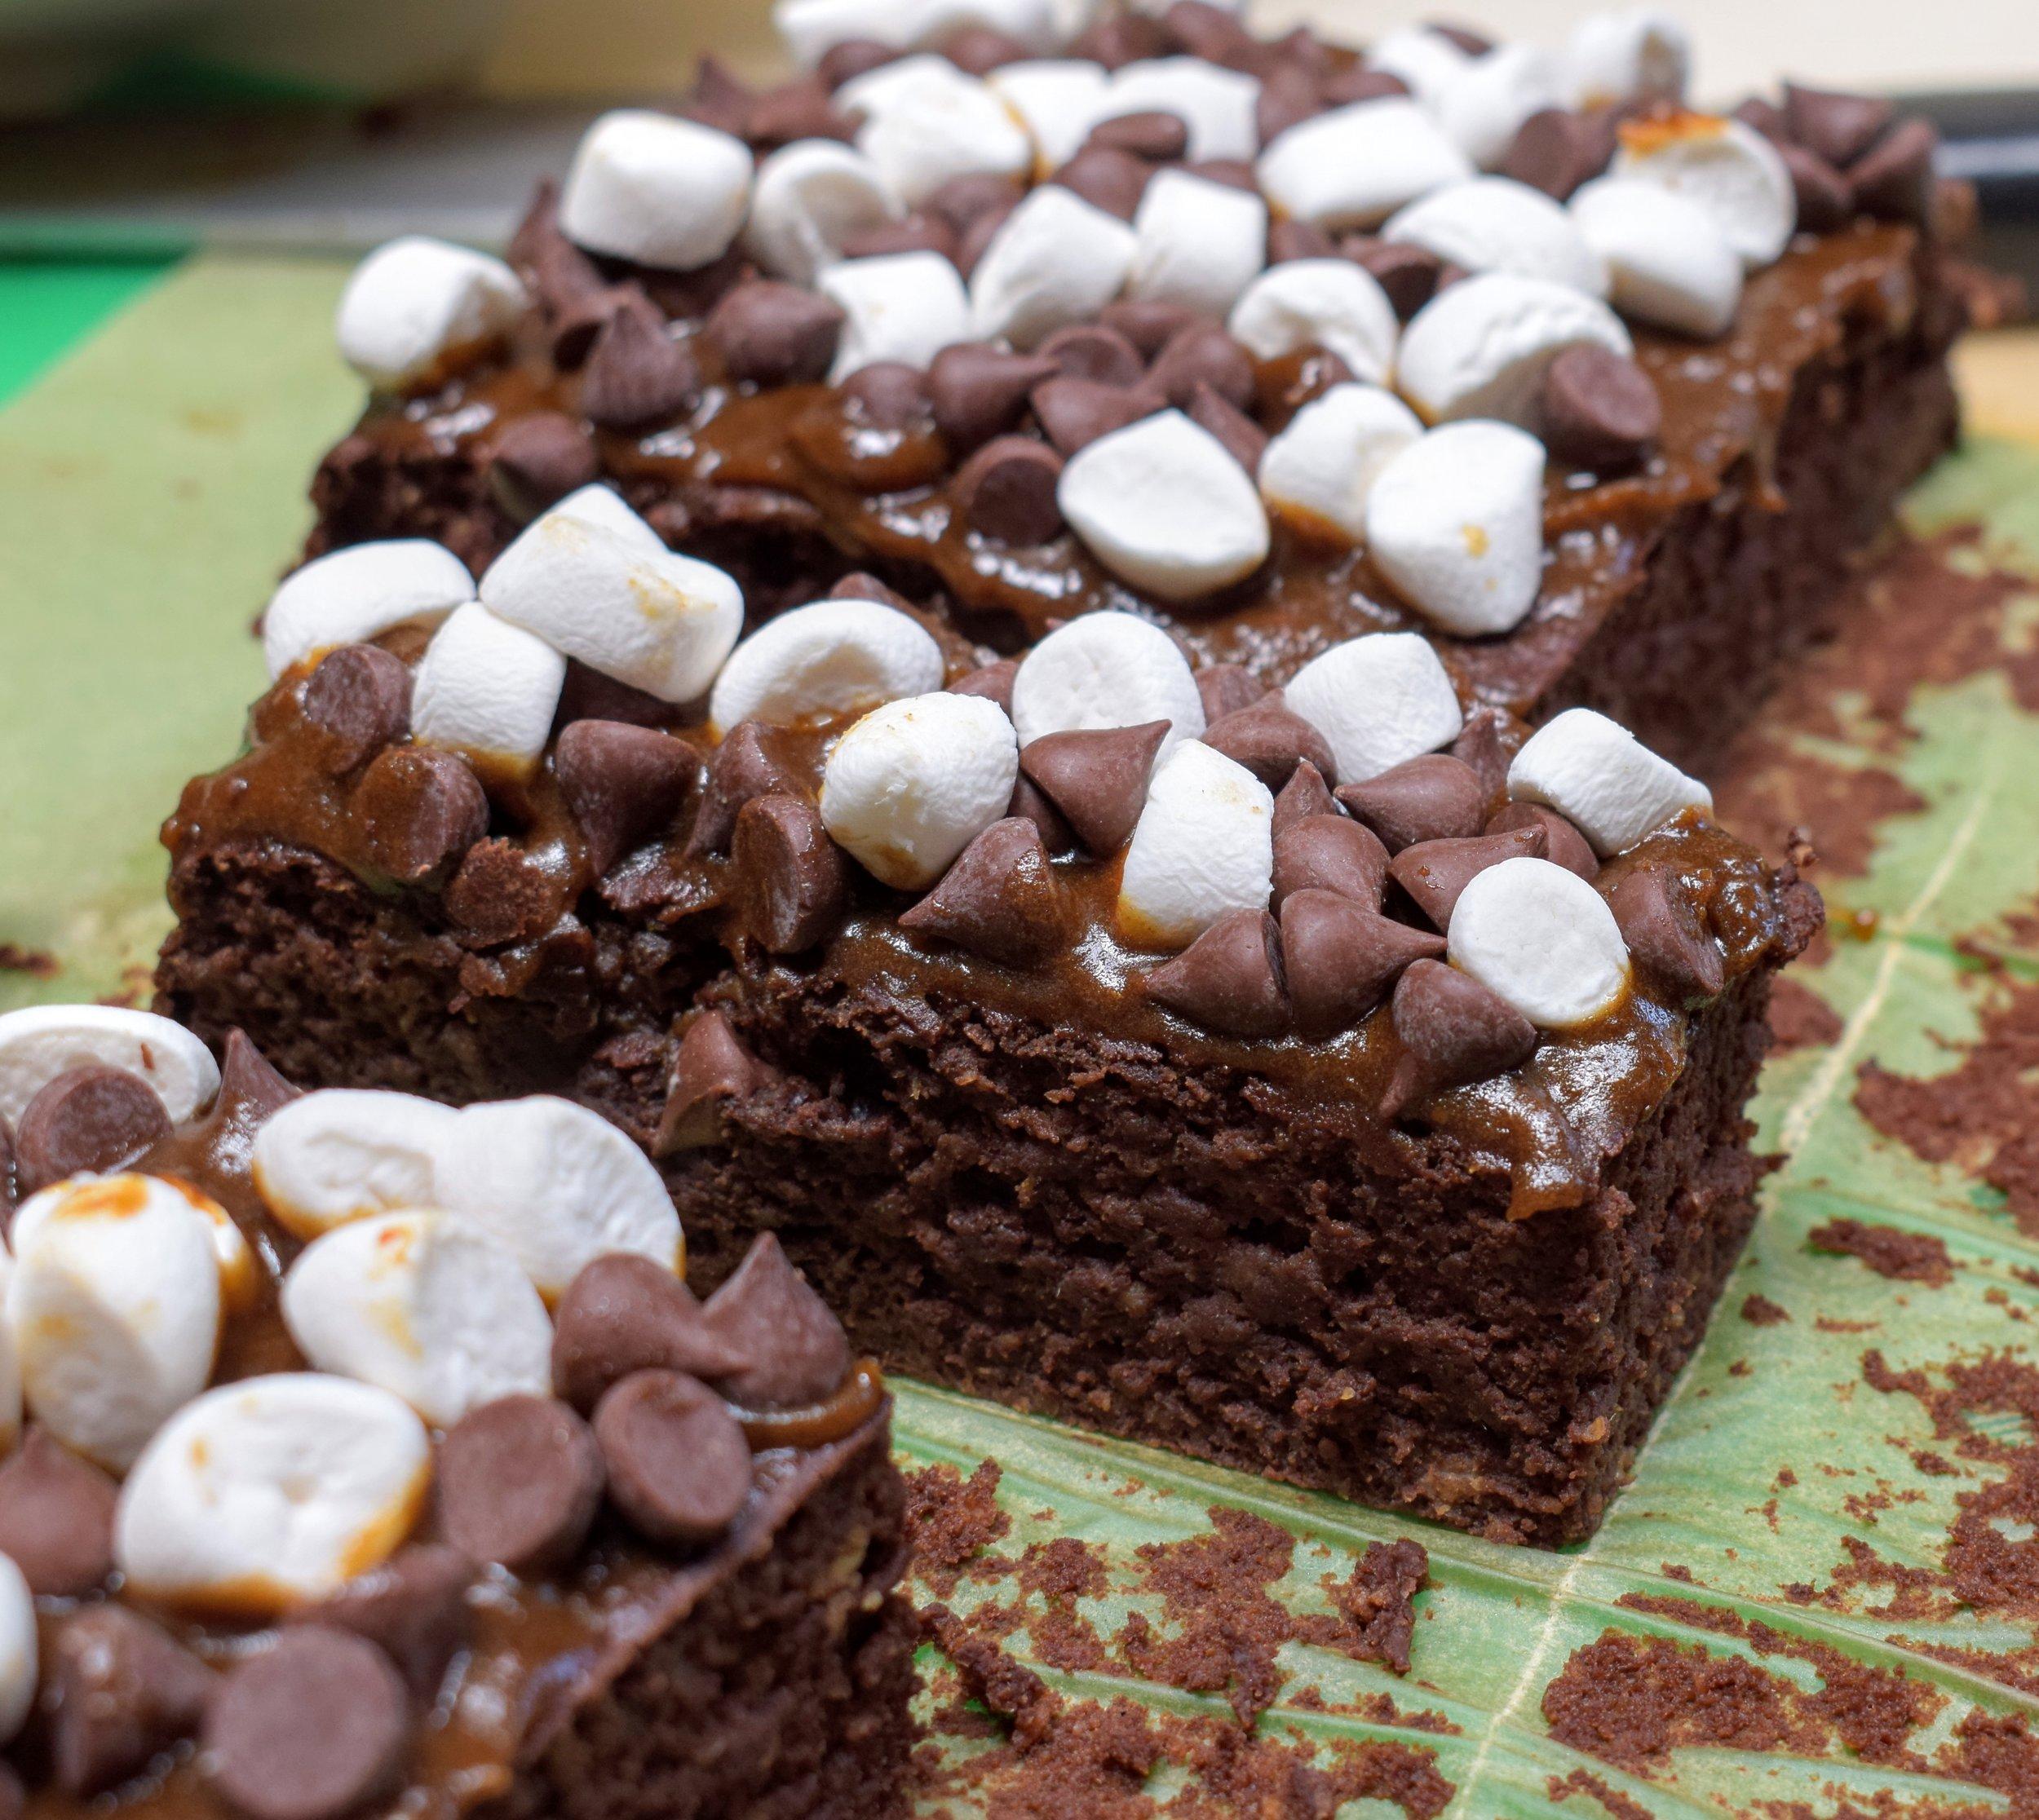 Ch oat flour cake.JPG